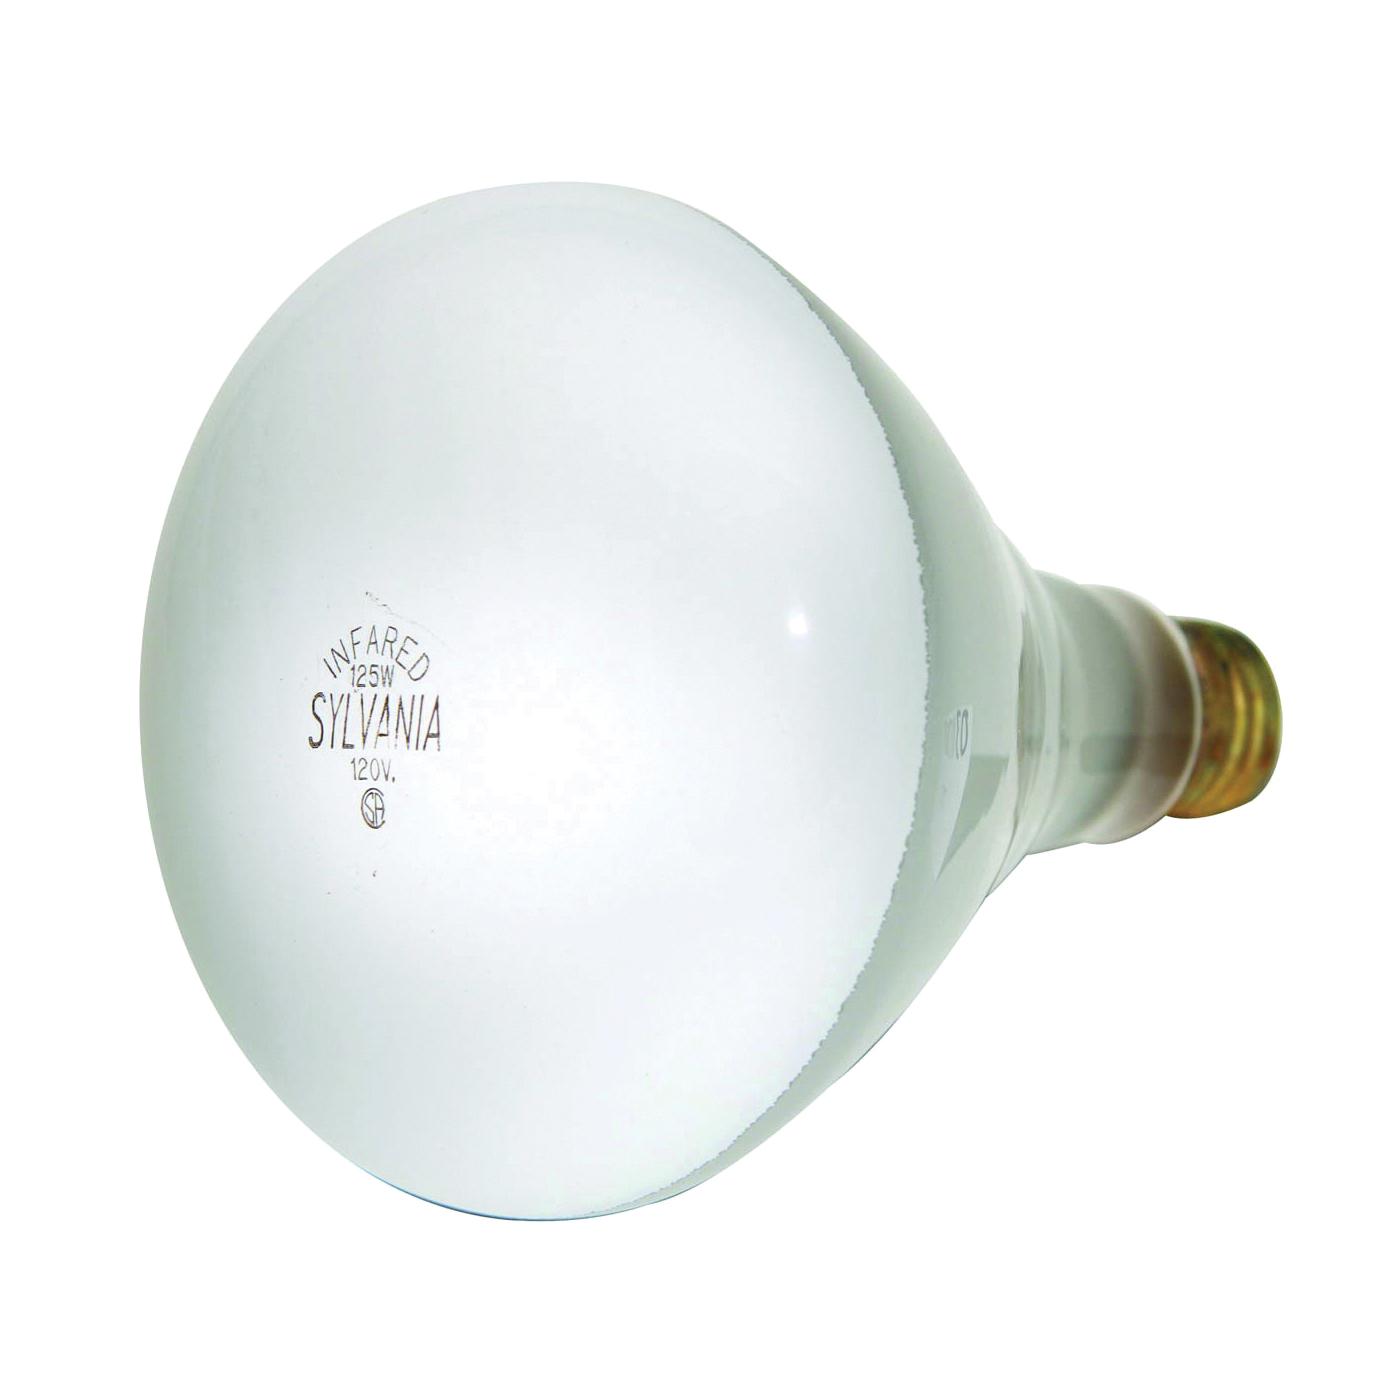 Picture of Sylvania 15451 Incandescent Lamp, 125 W, BR40 Lamp, Medium E26 Lamp Base, 1000 Lumens, 2850 K Color Temp